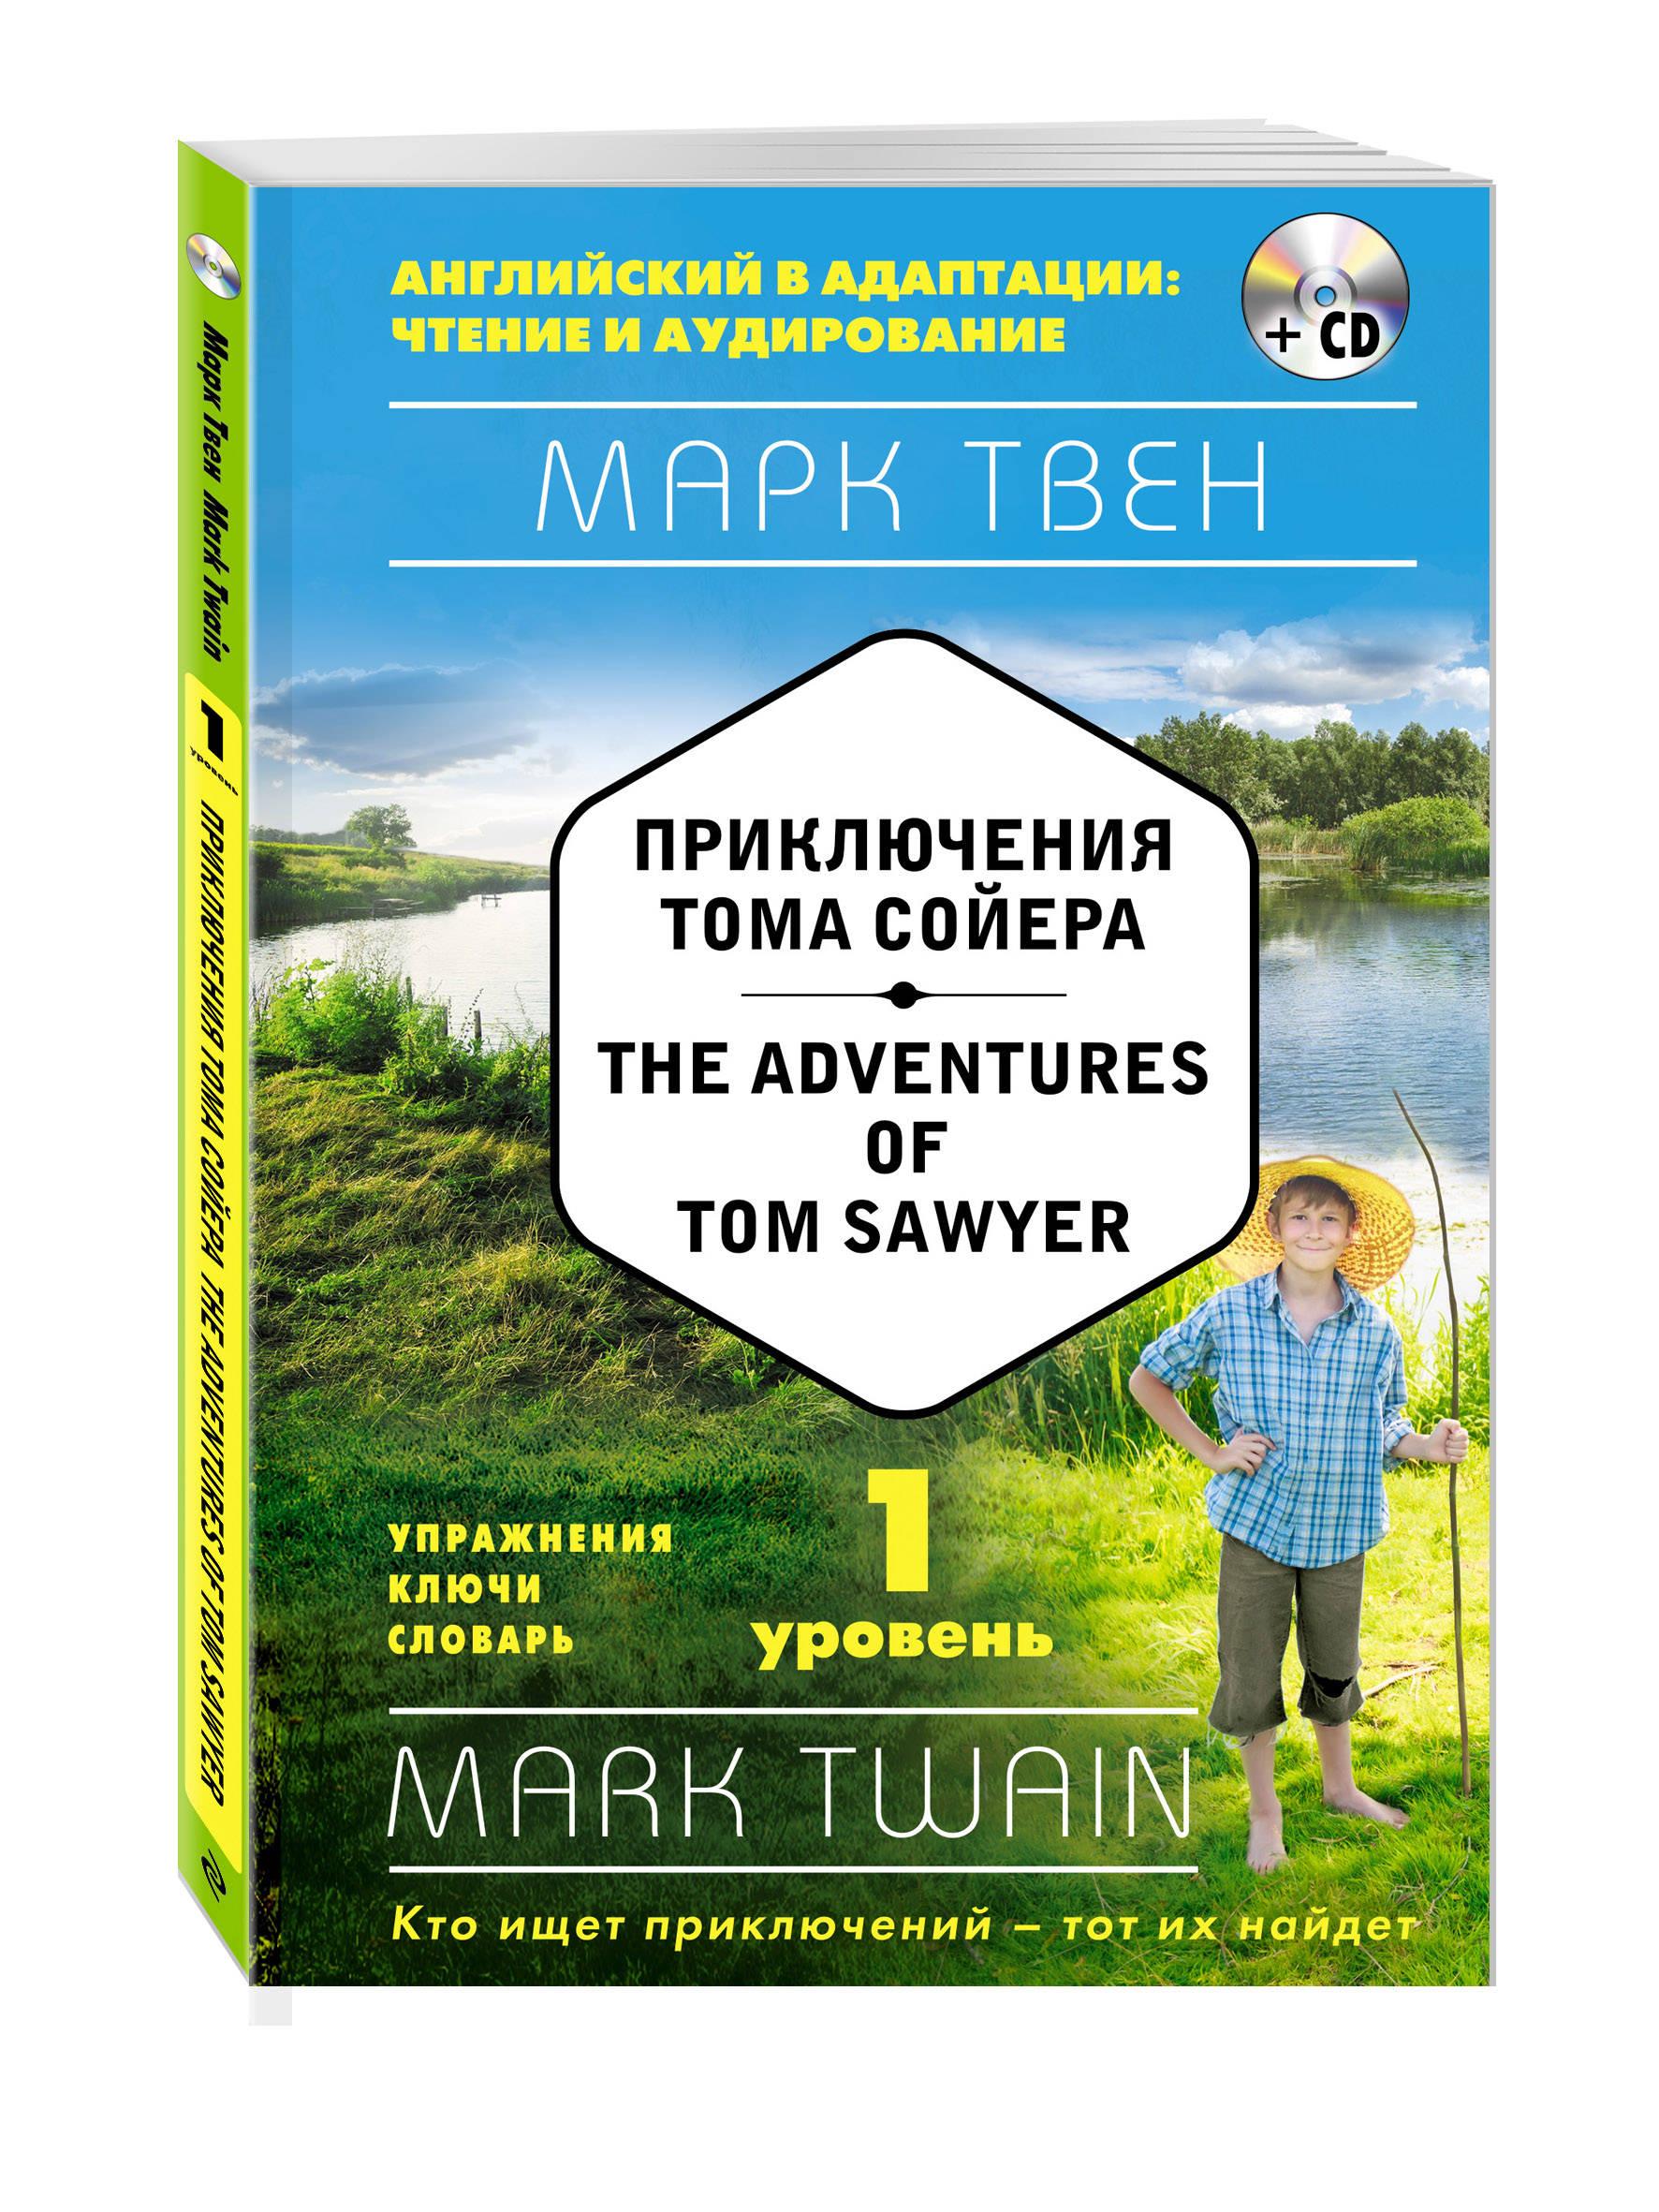 Твен М. Приключения Тома Сойера = The Adventures of Tom Sawyer (+ СD): 1-й уровень твен м the adventures of tom sawyer приключения тома сойера